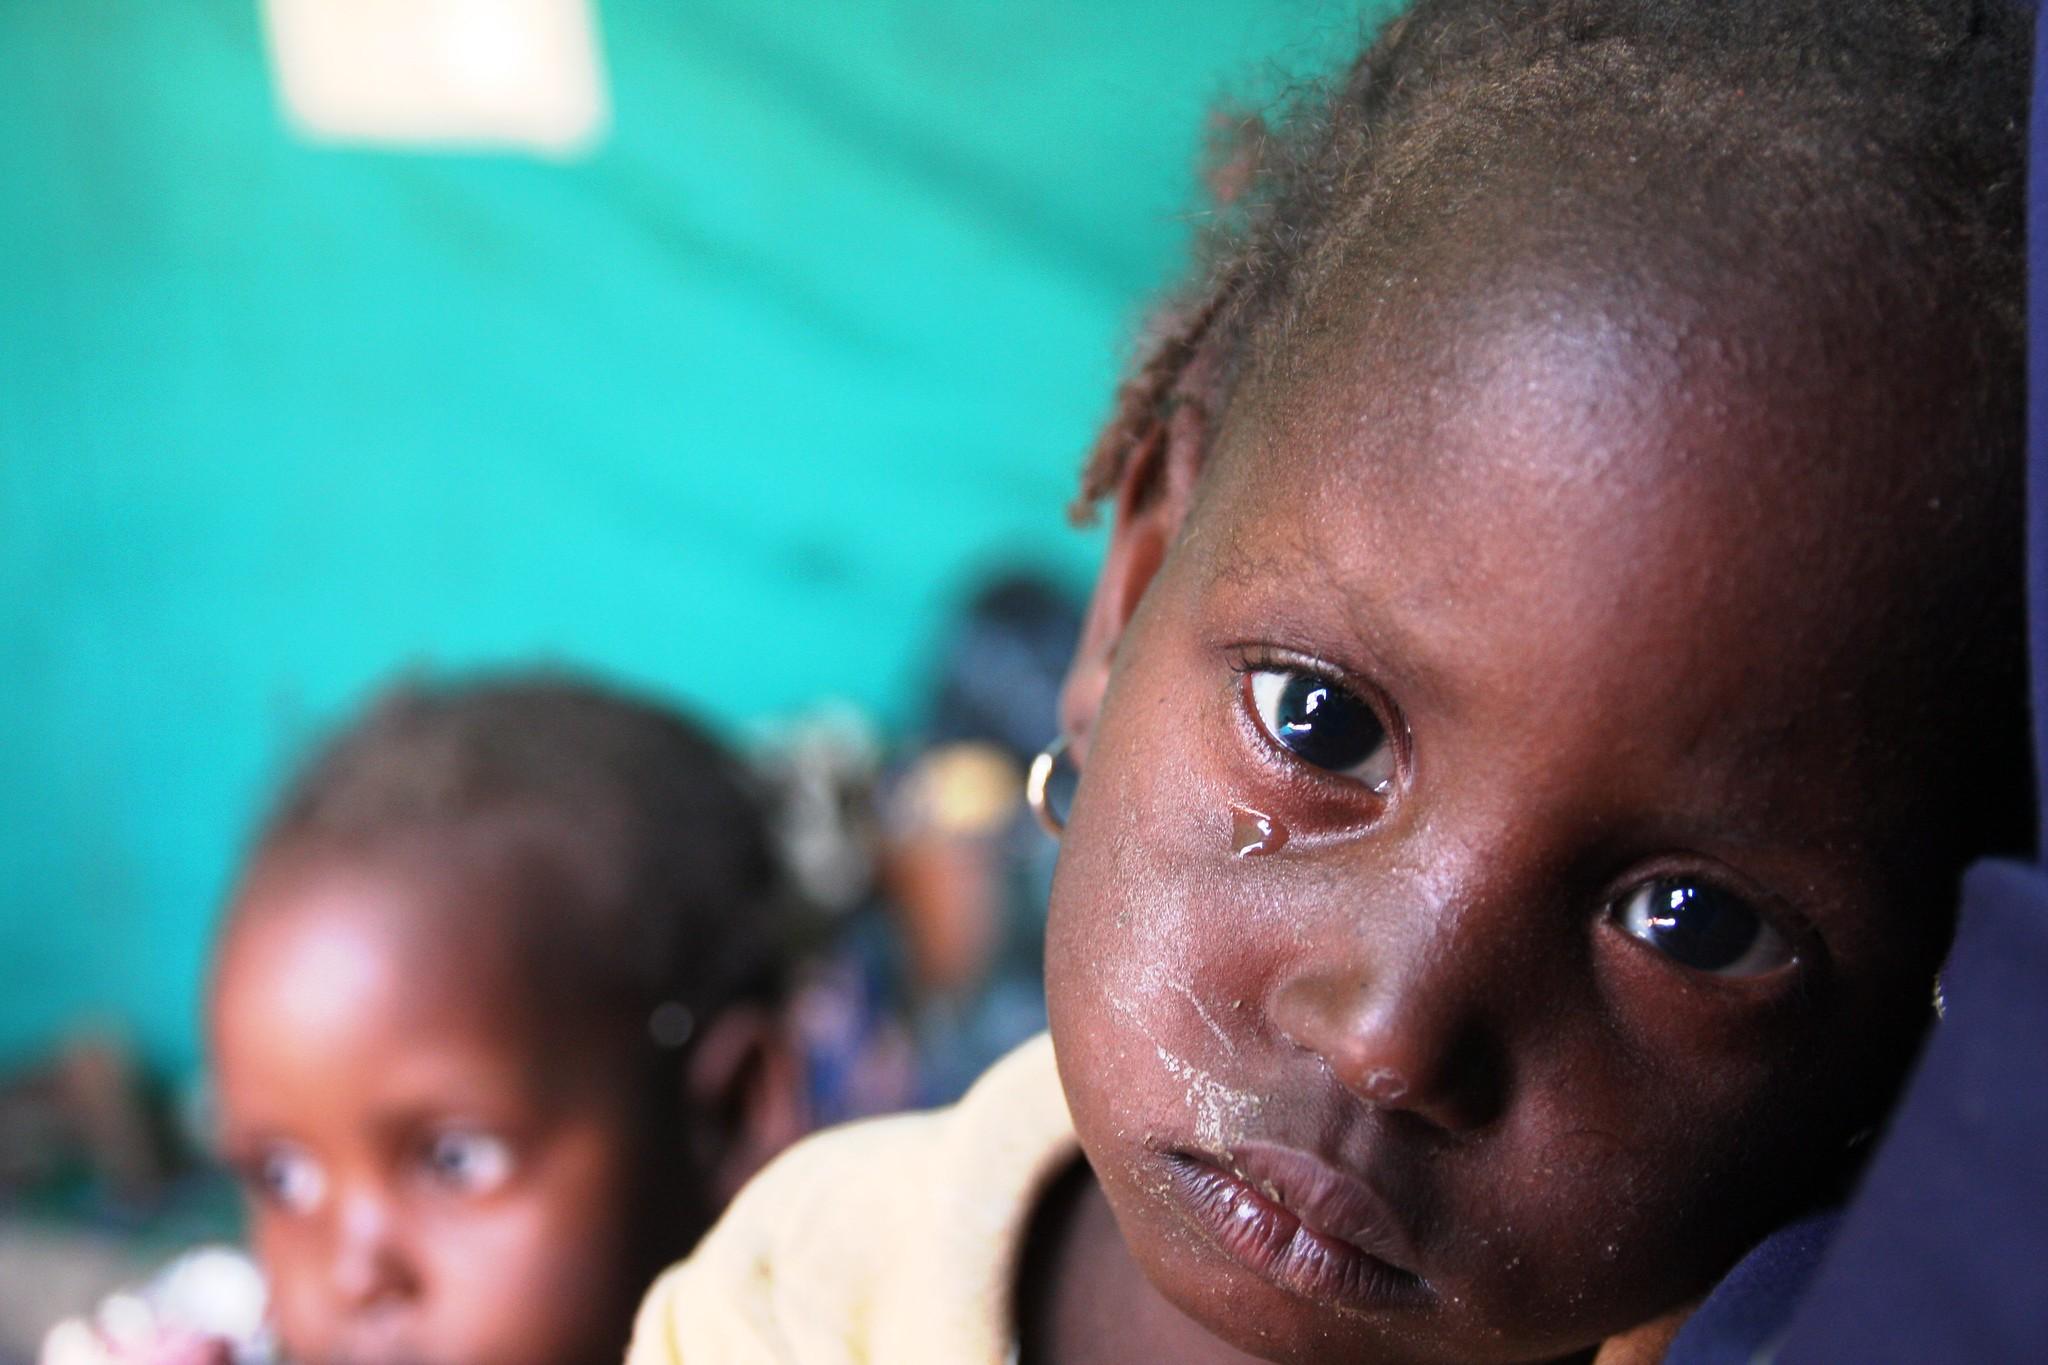 Nigerian schoolchildren safe, Christians remain on guard